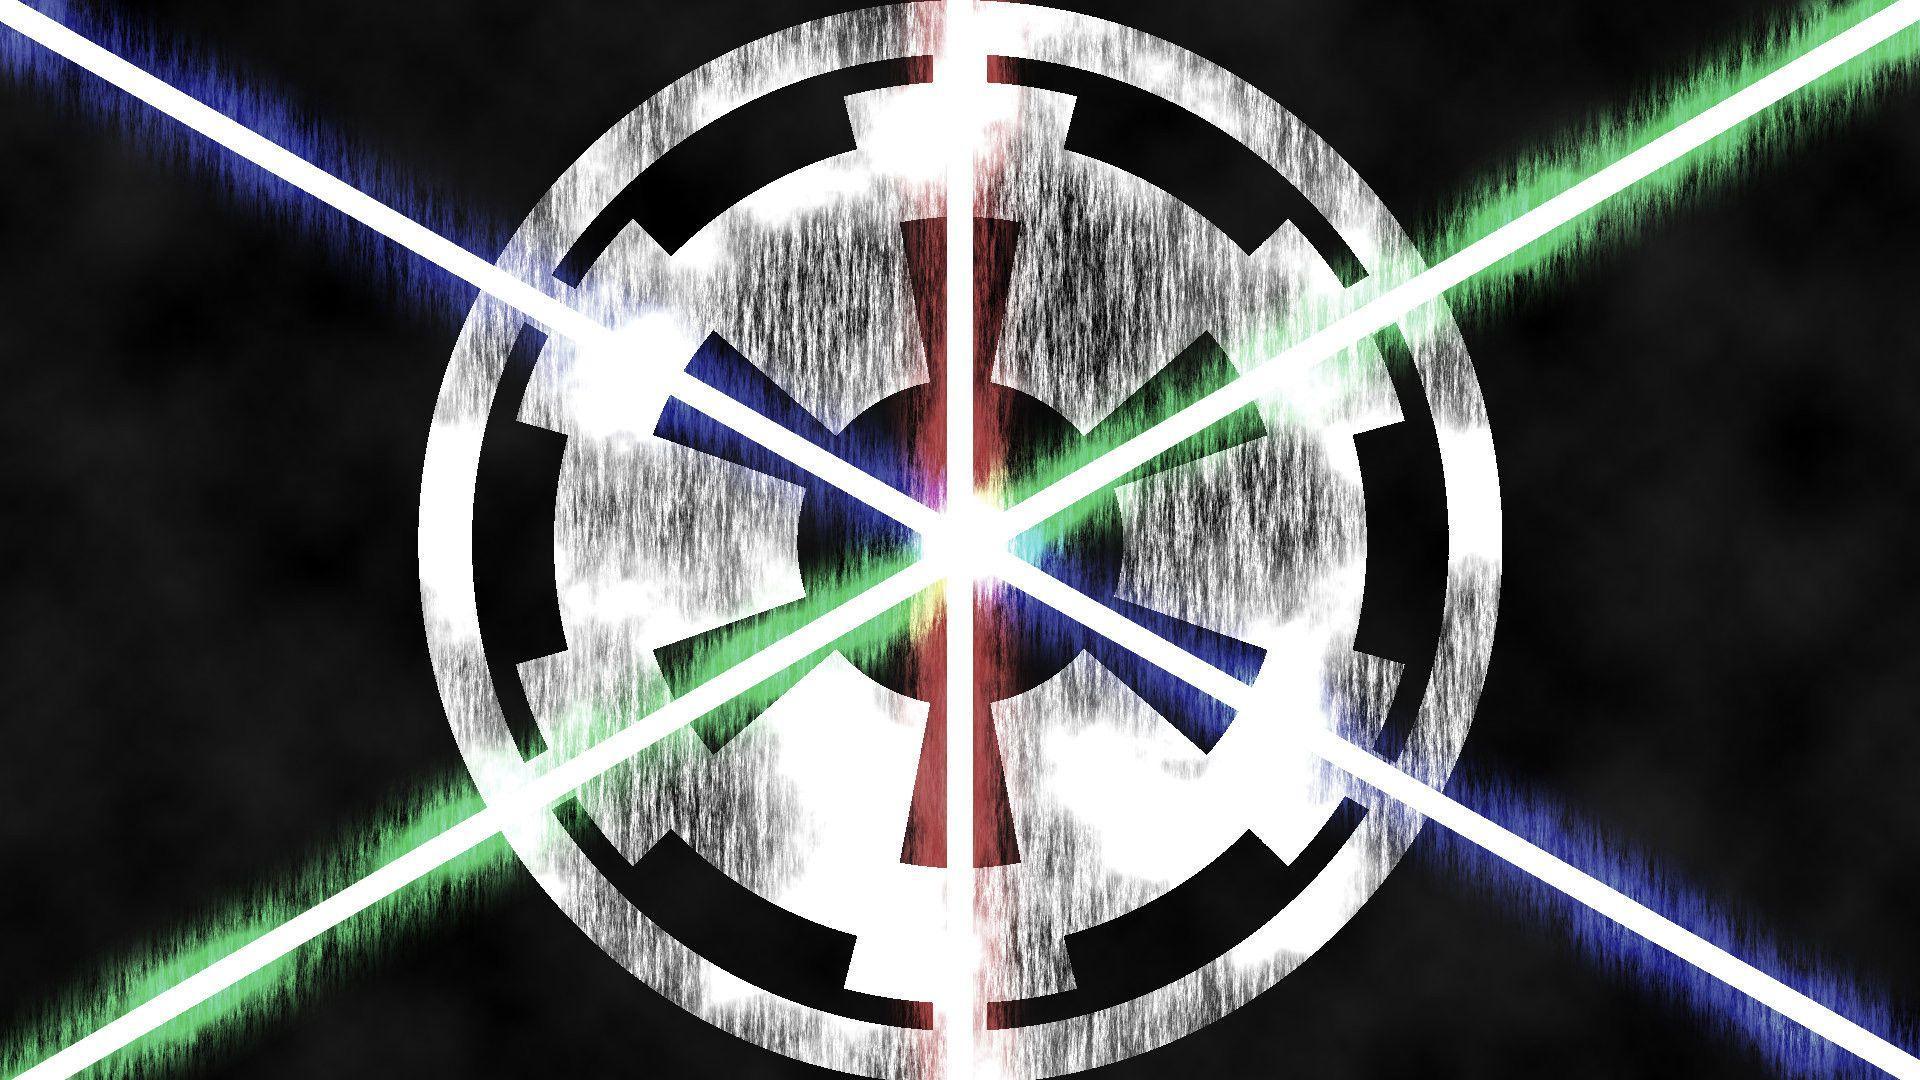 star wars empire wallpaper hd - photo #17